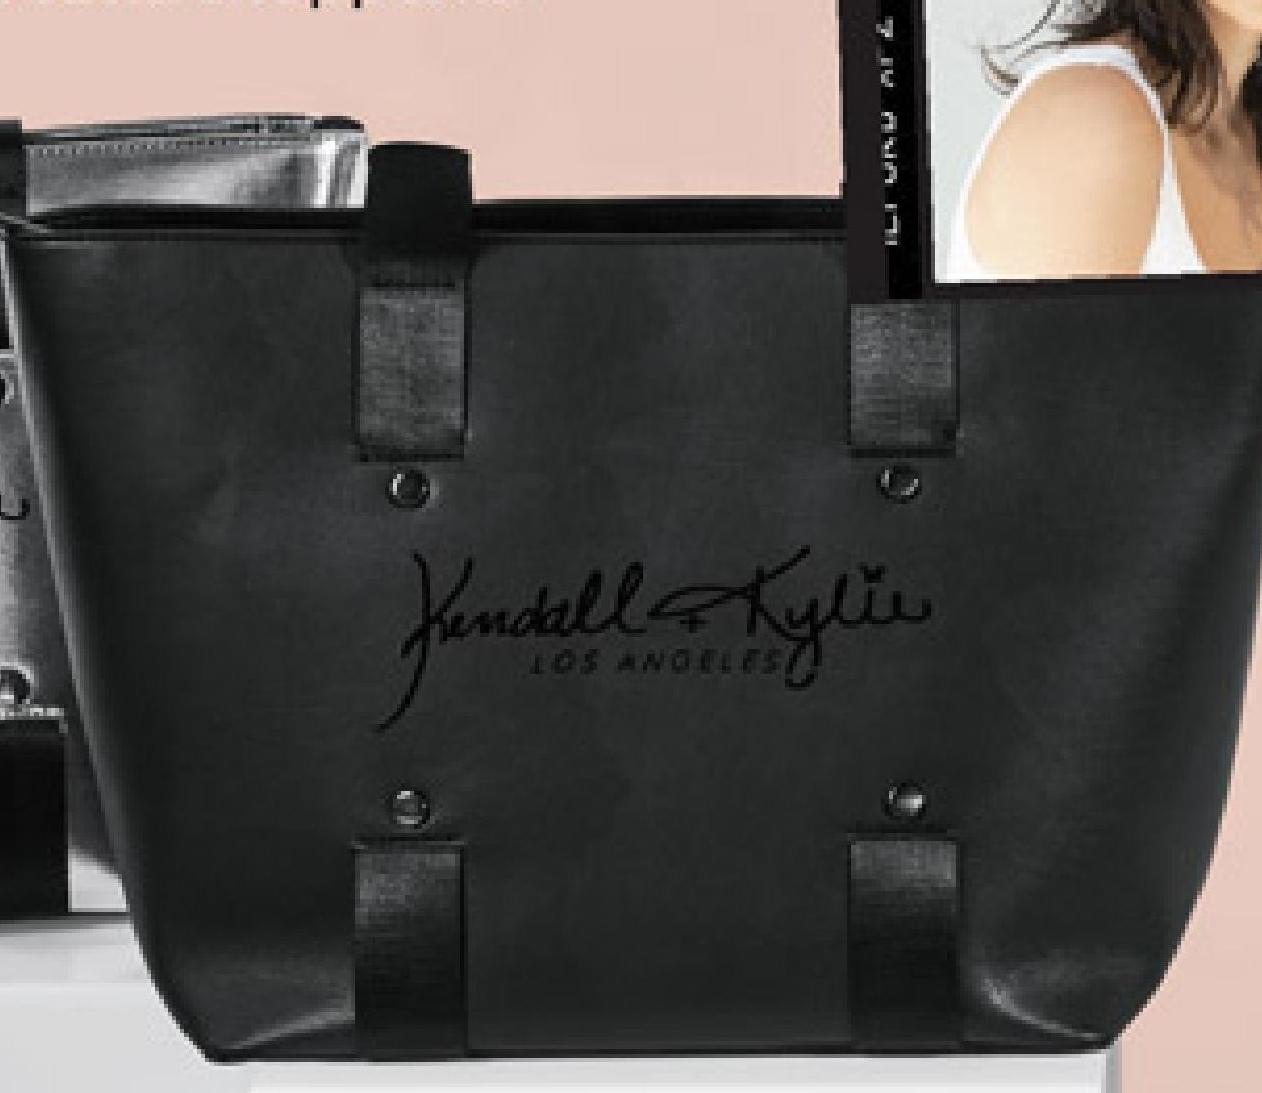 Kendall&Kyli niska cena